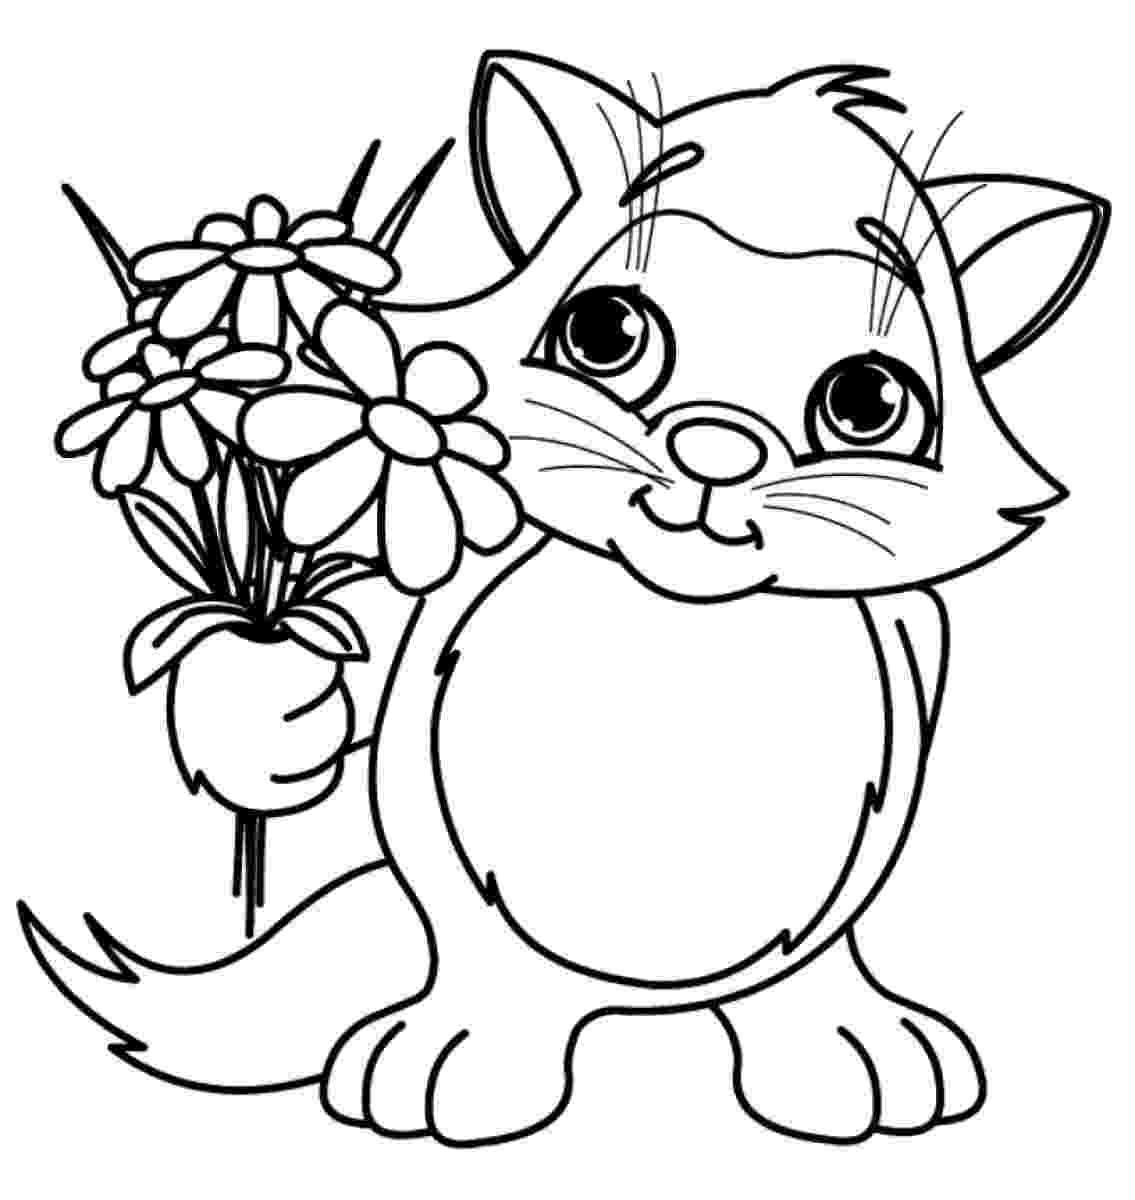 flower printables free printable flower coloring pages for kids best flower printables 1 3